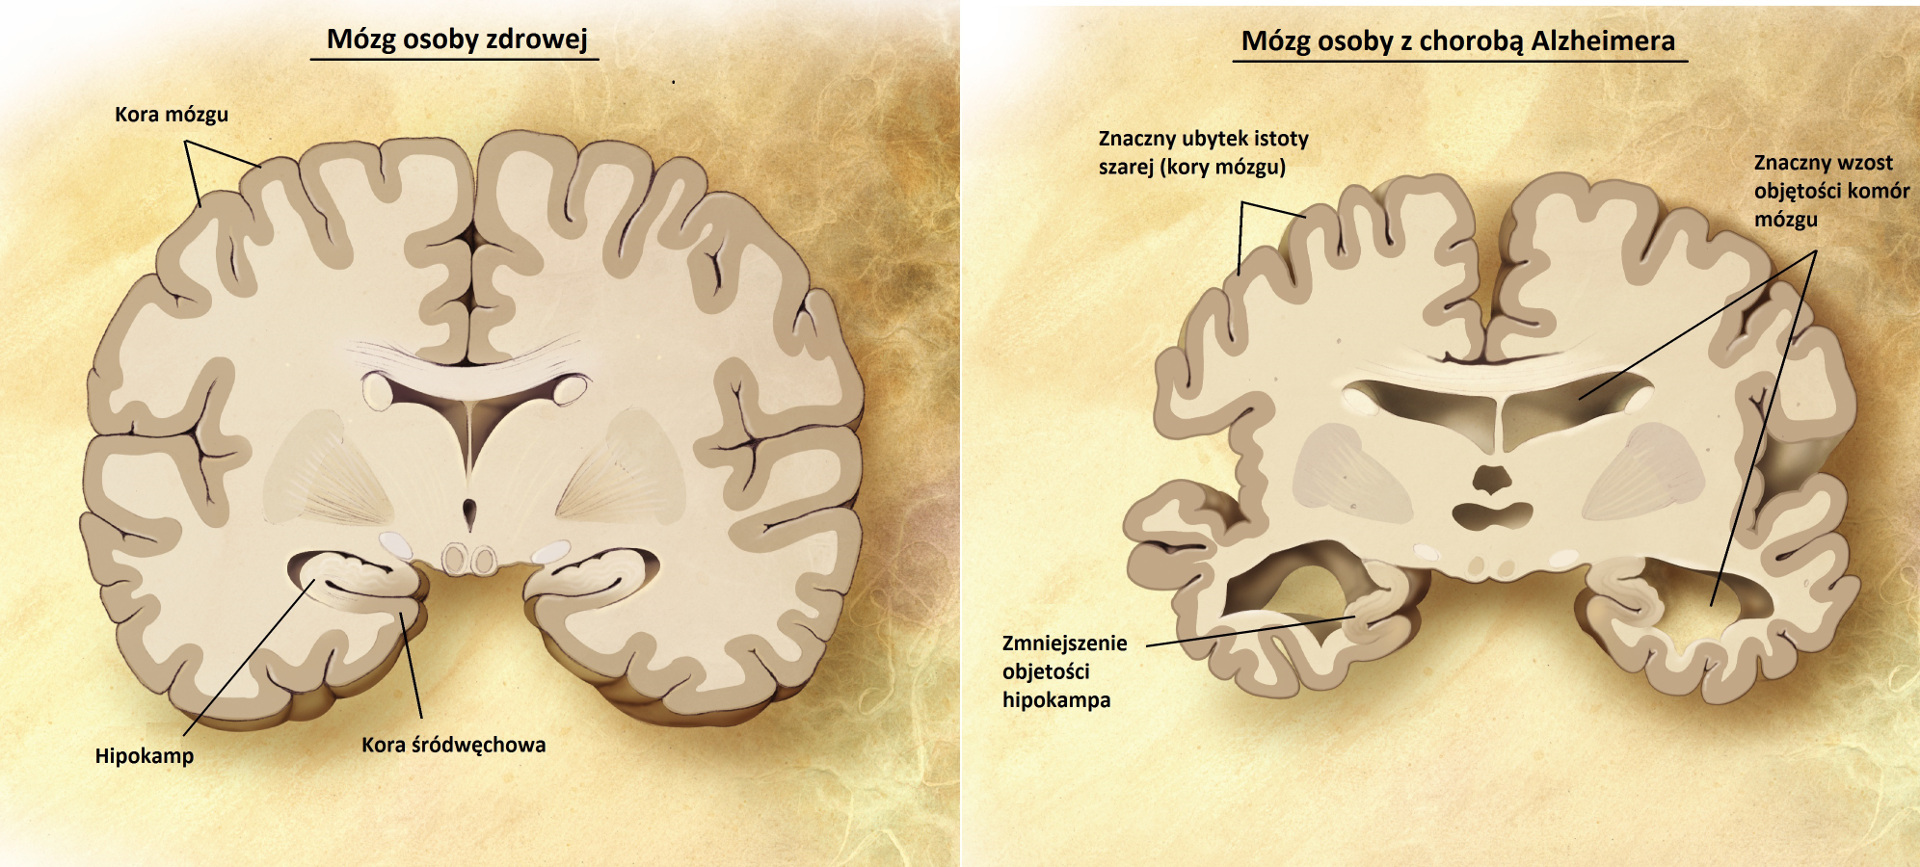 Porównanie mózgu osoby zdrowej i chorej na Alzheimera.